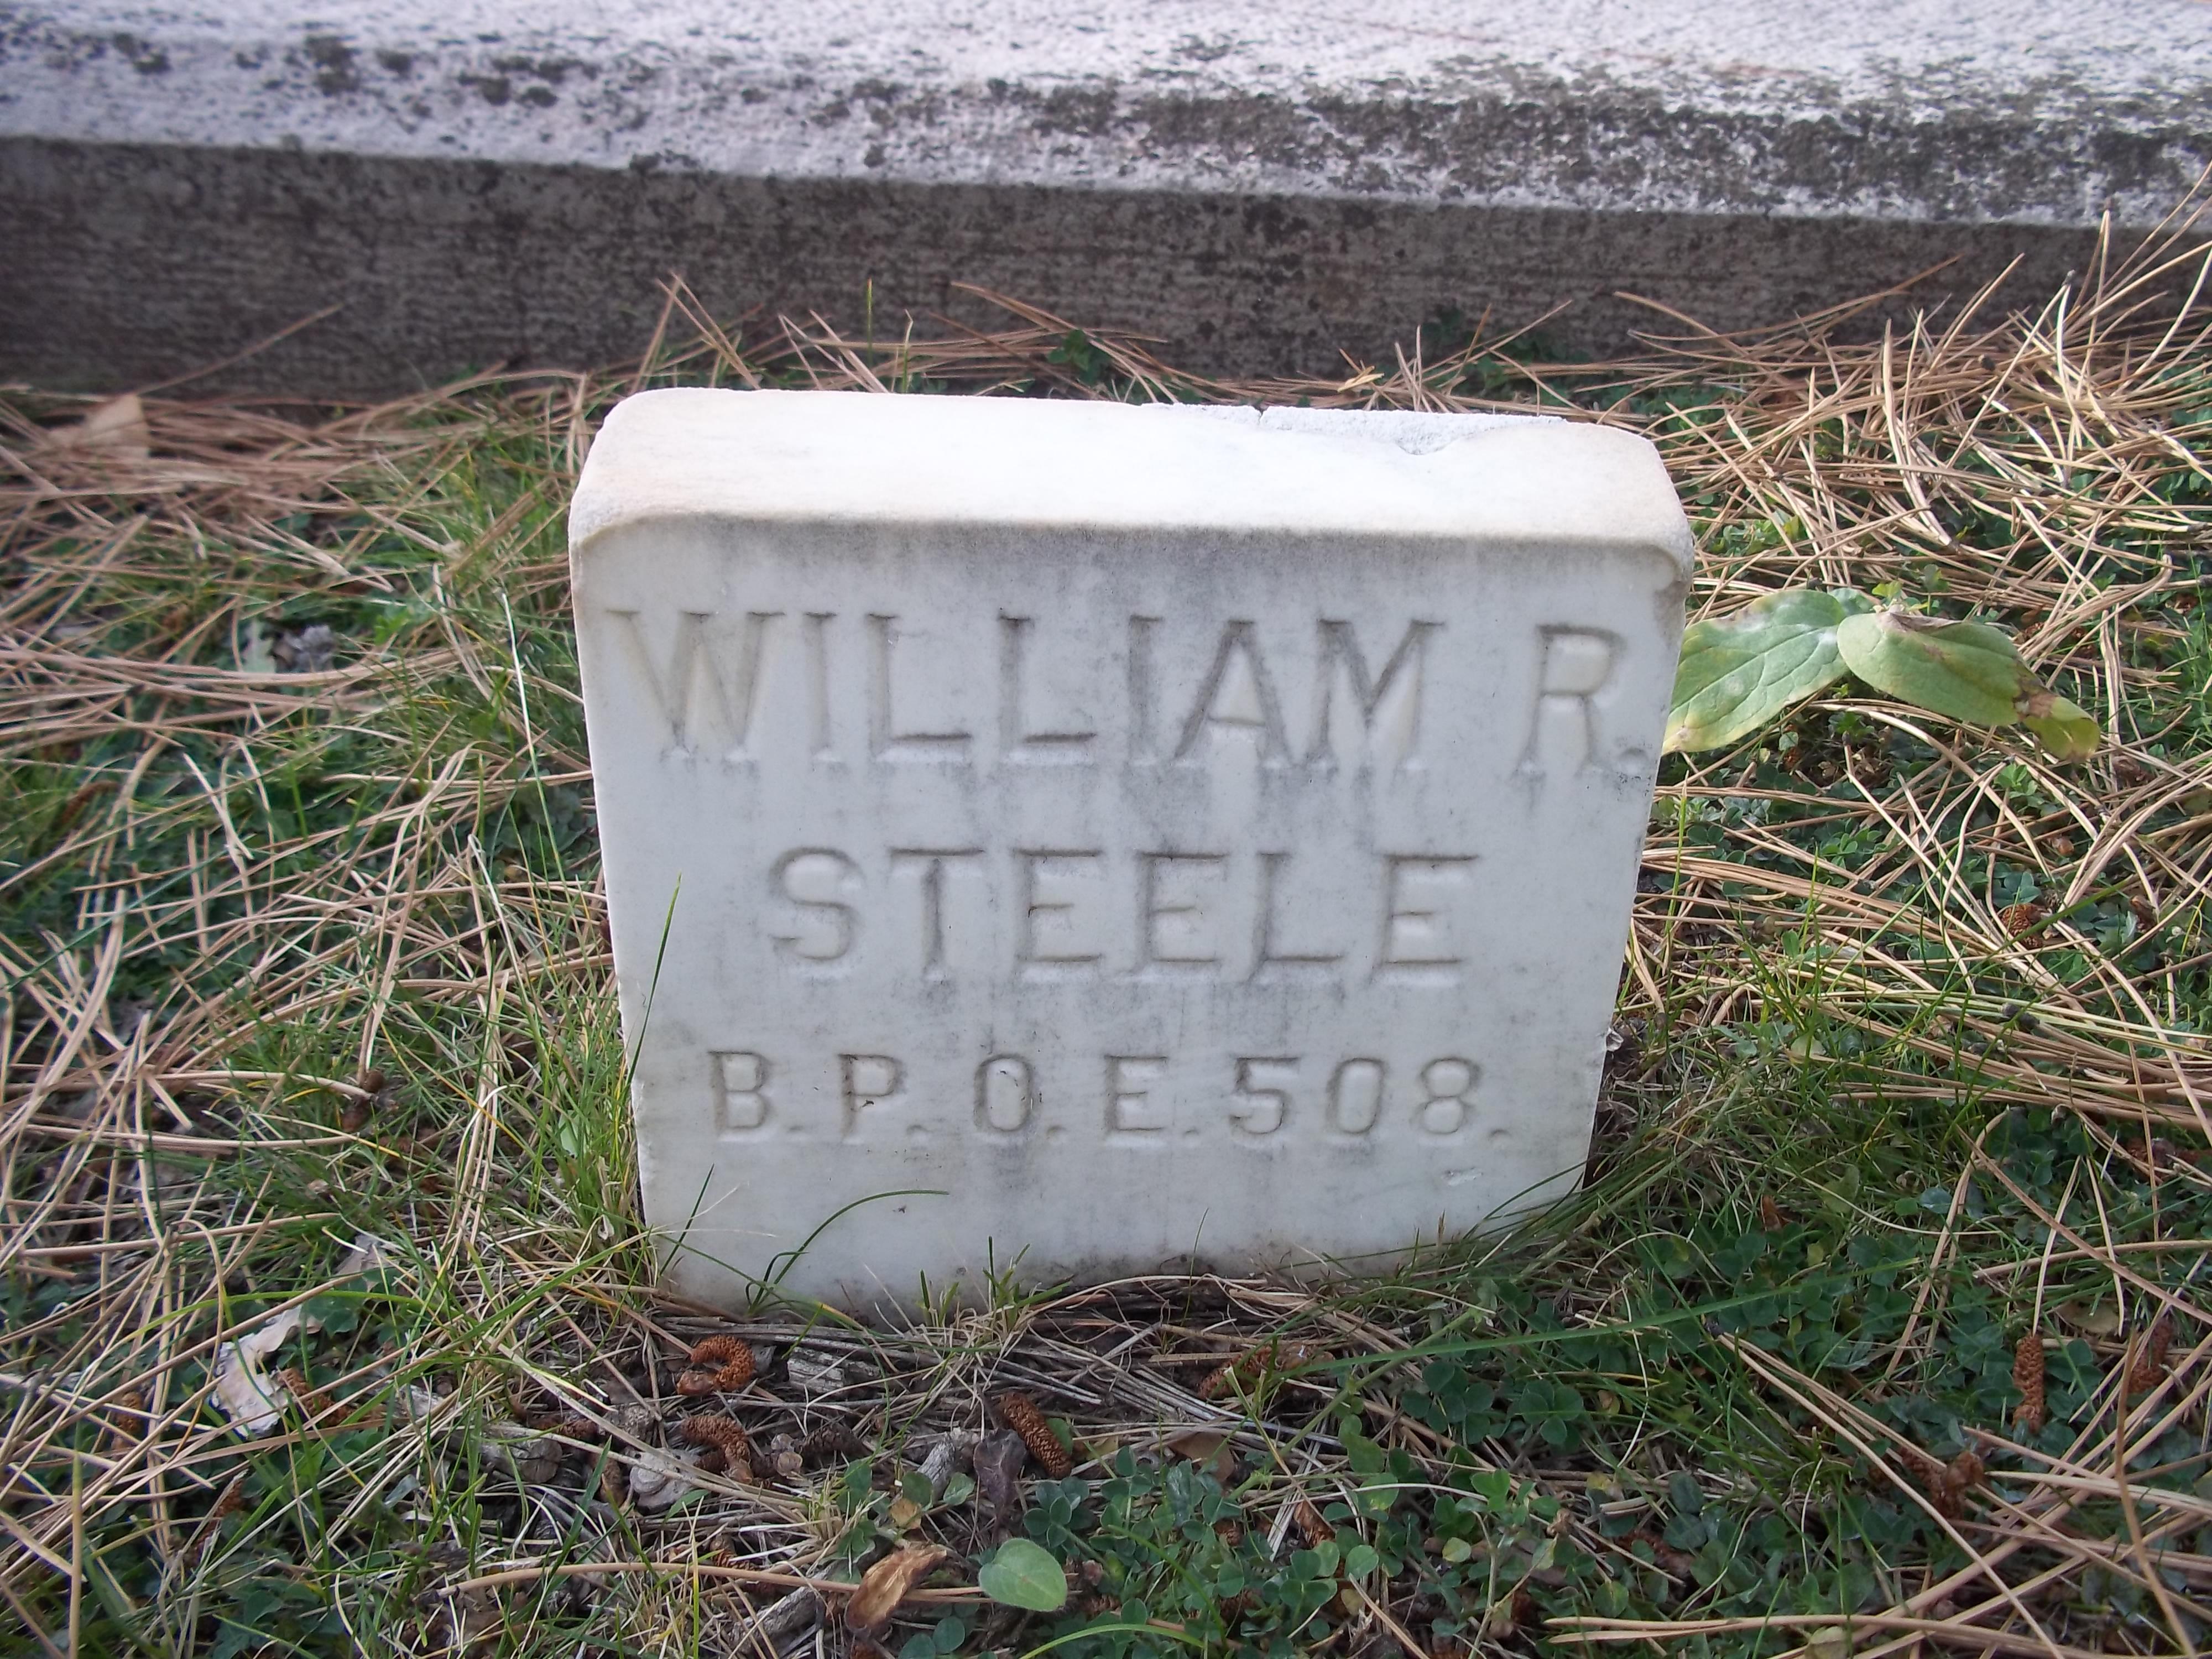 William Randolph Steele